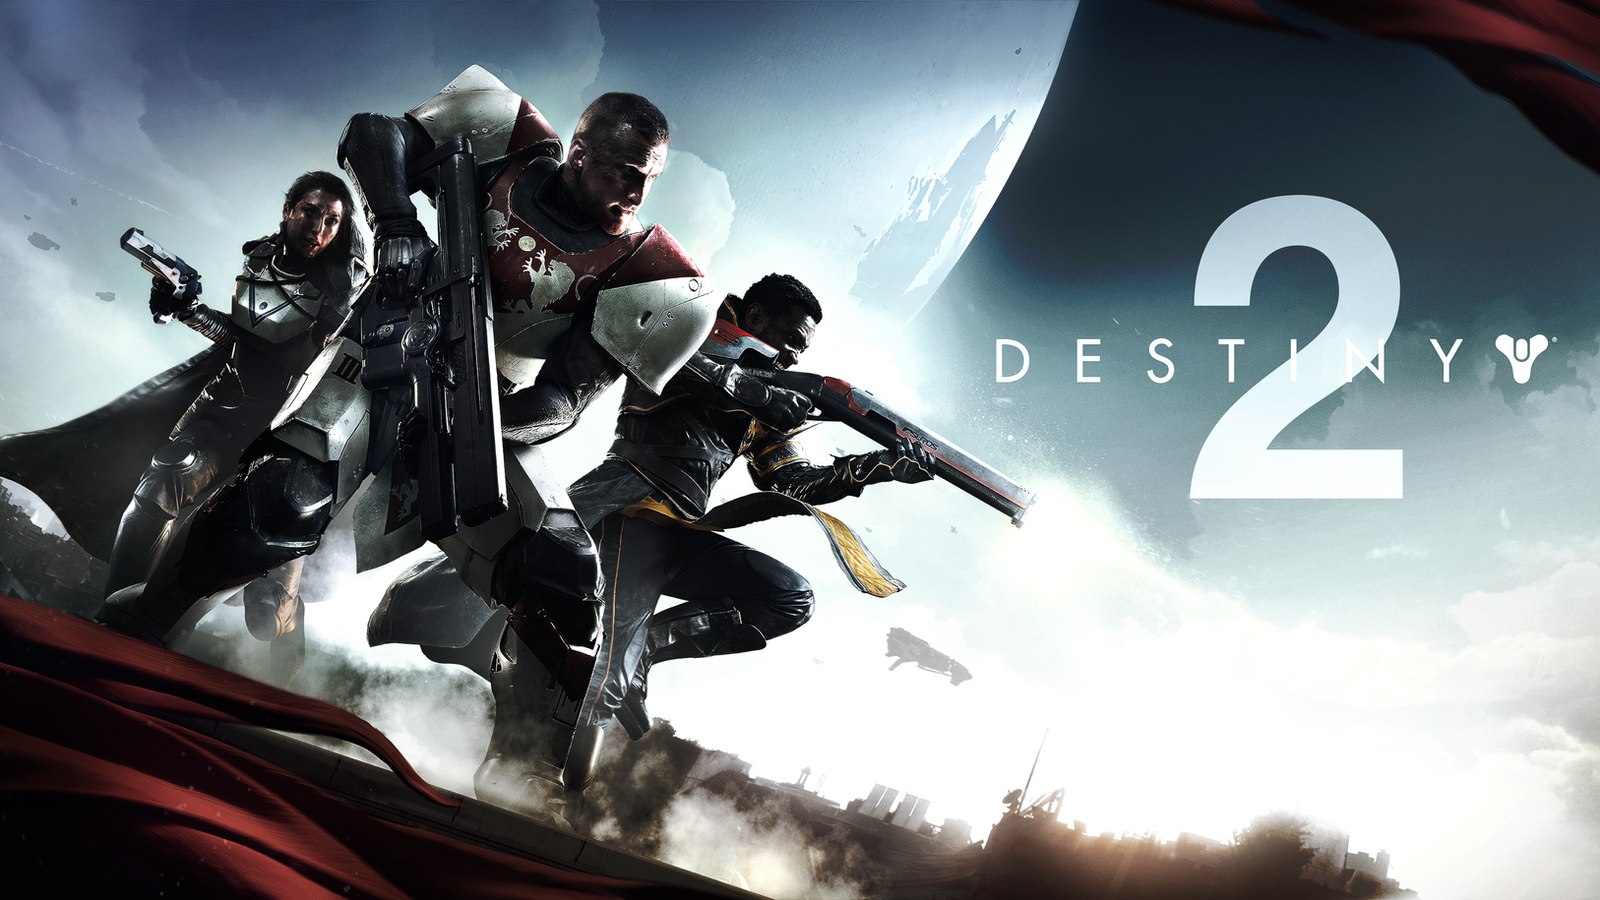 Destiny 2 guardians 4k wallpaper by nurboyxvi on deviantart - 4k destiny 2 wallpaper ...